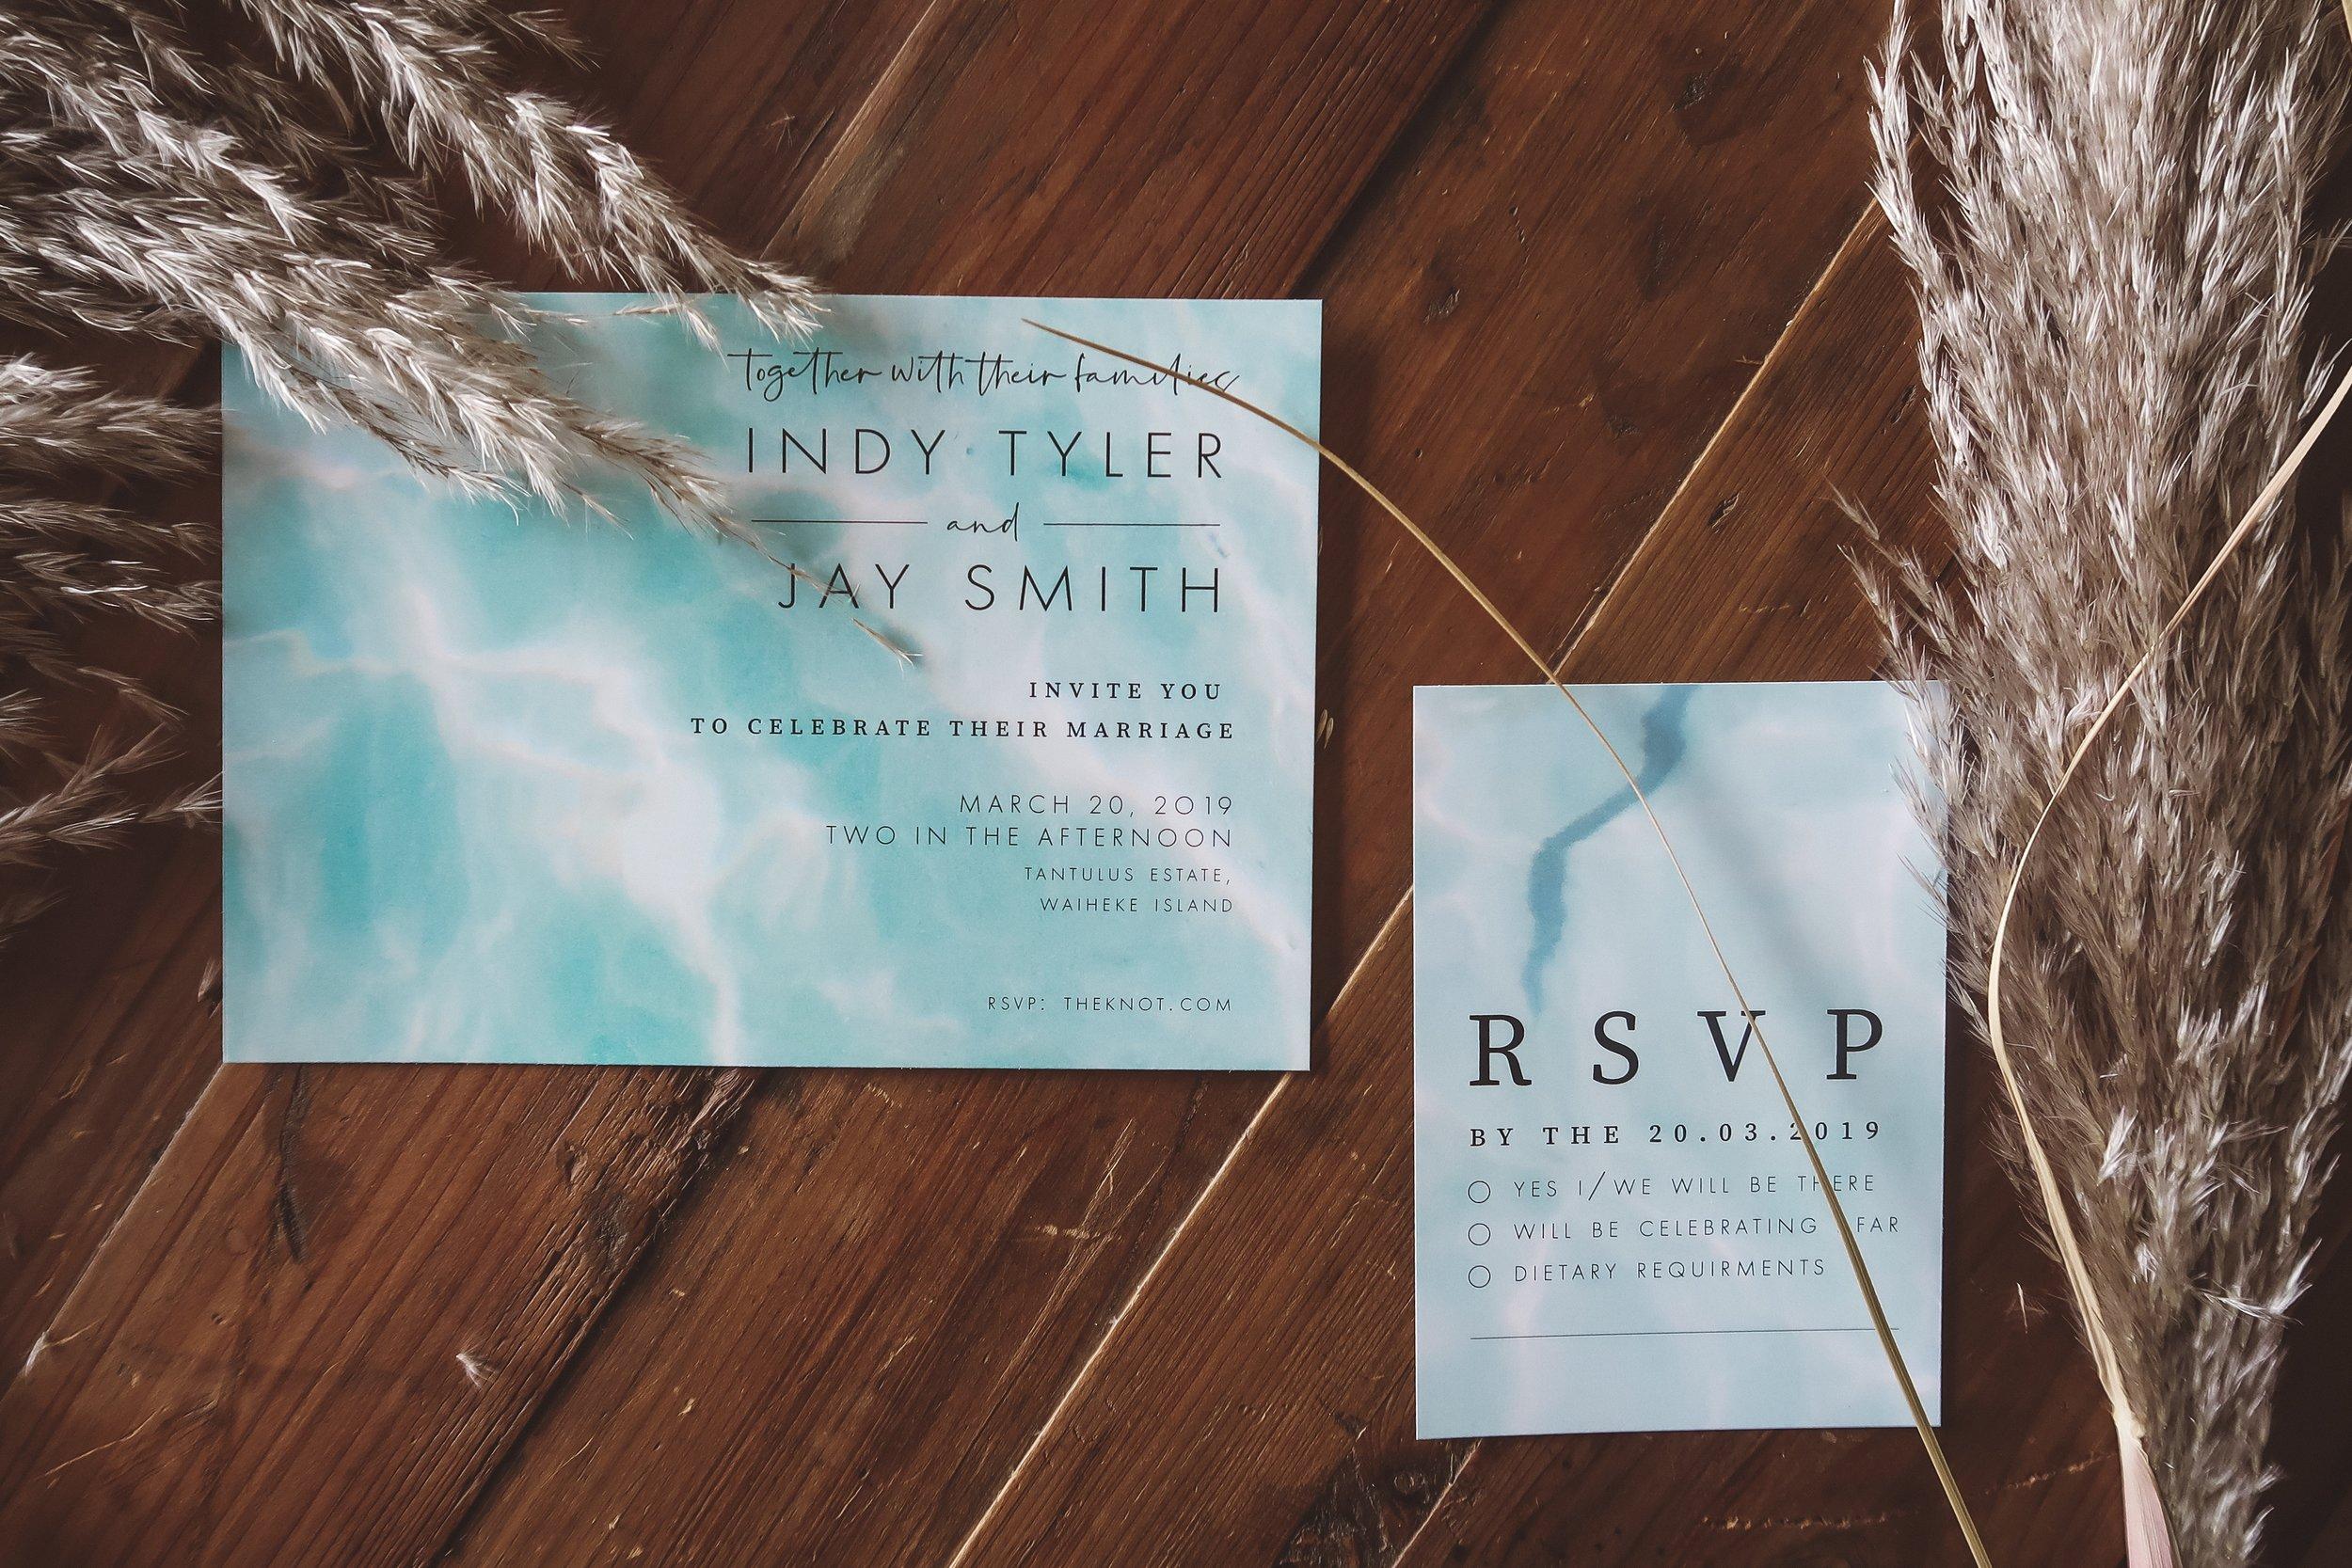 Tide Invitation + RSVP